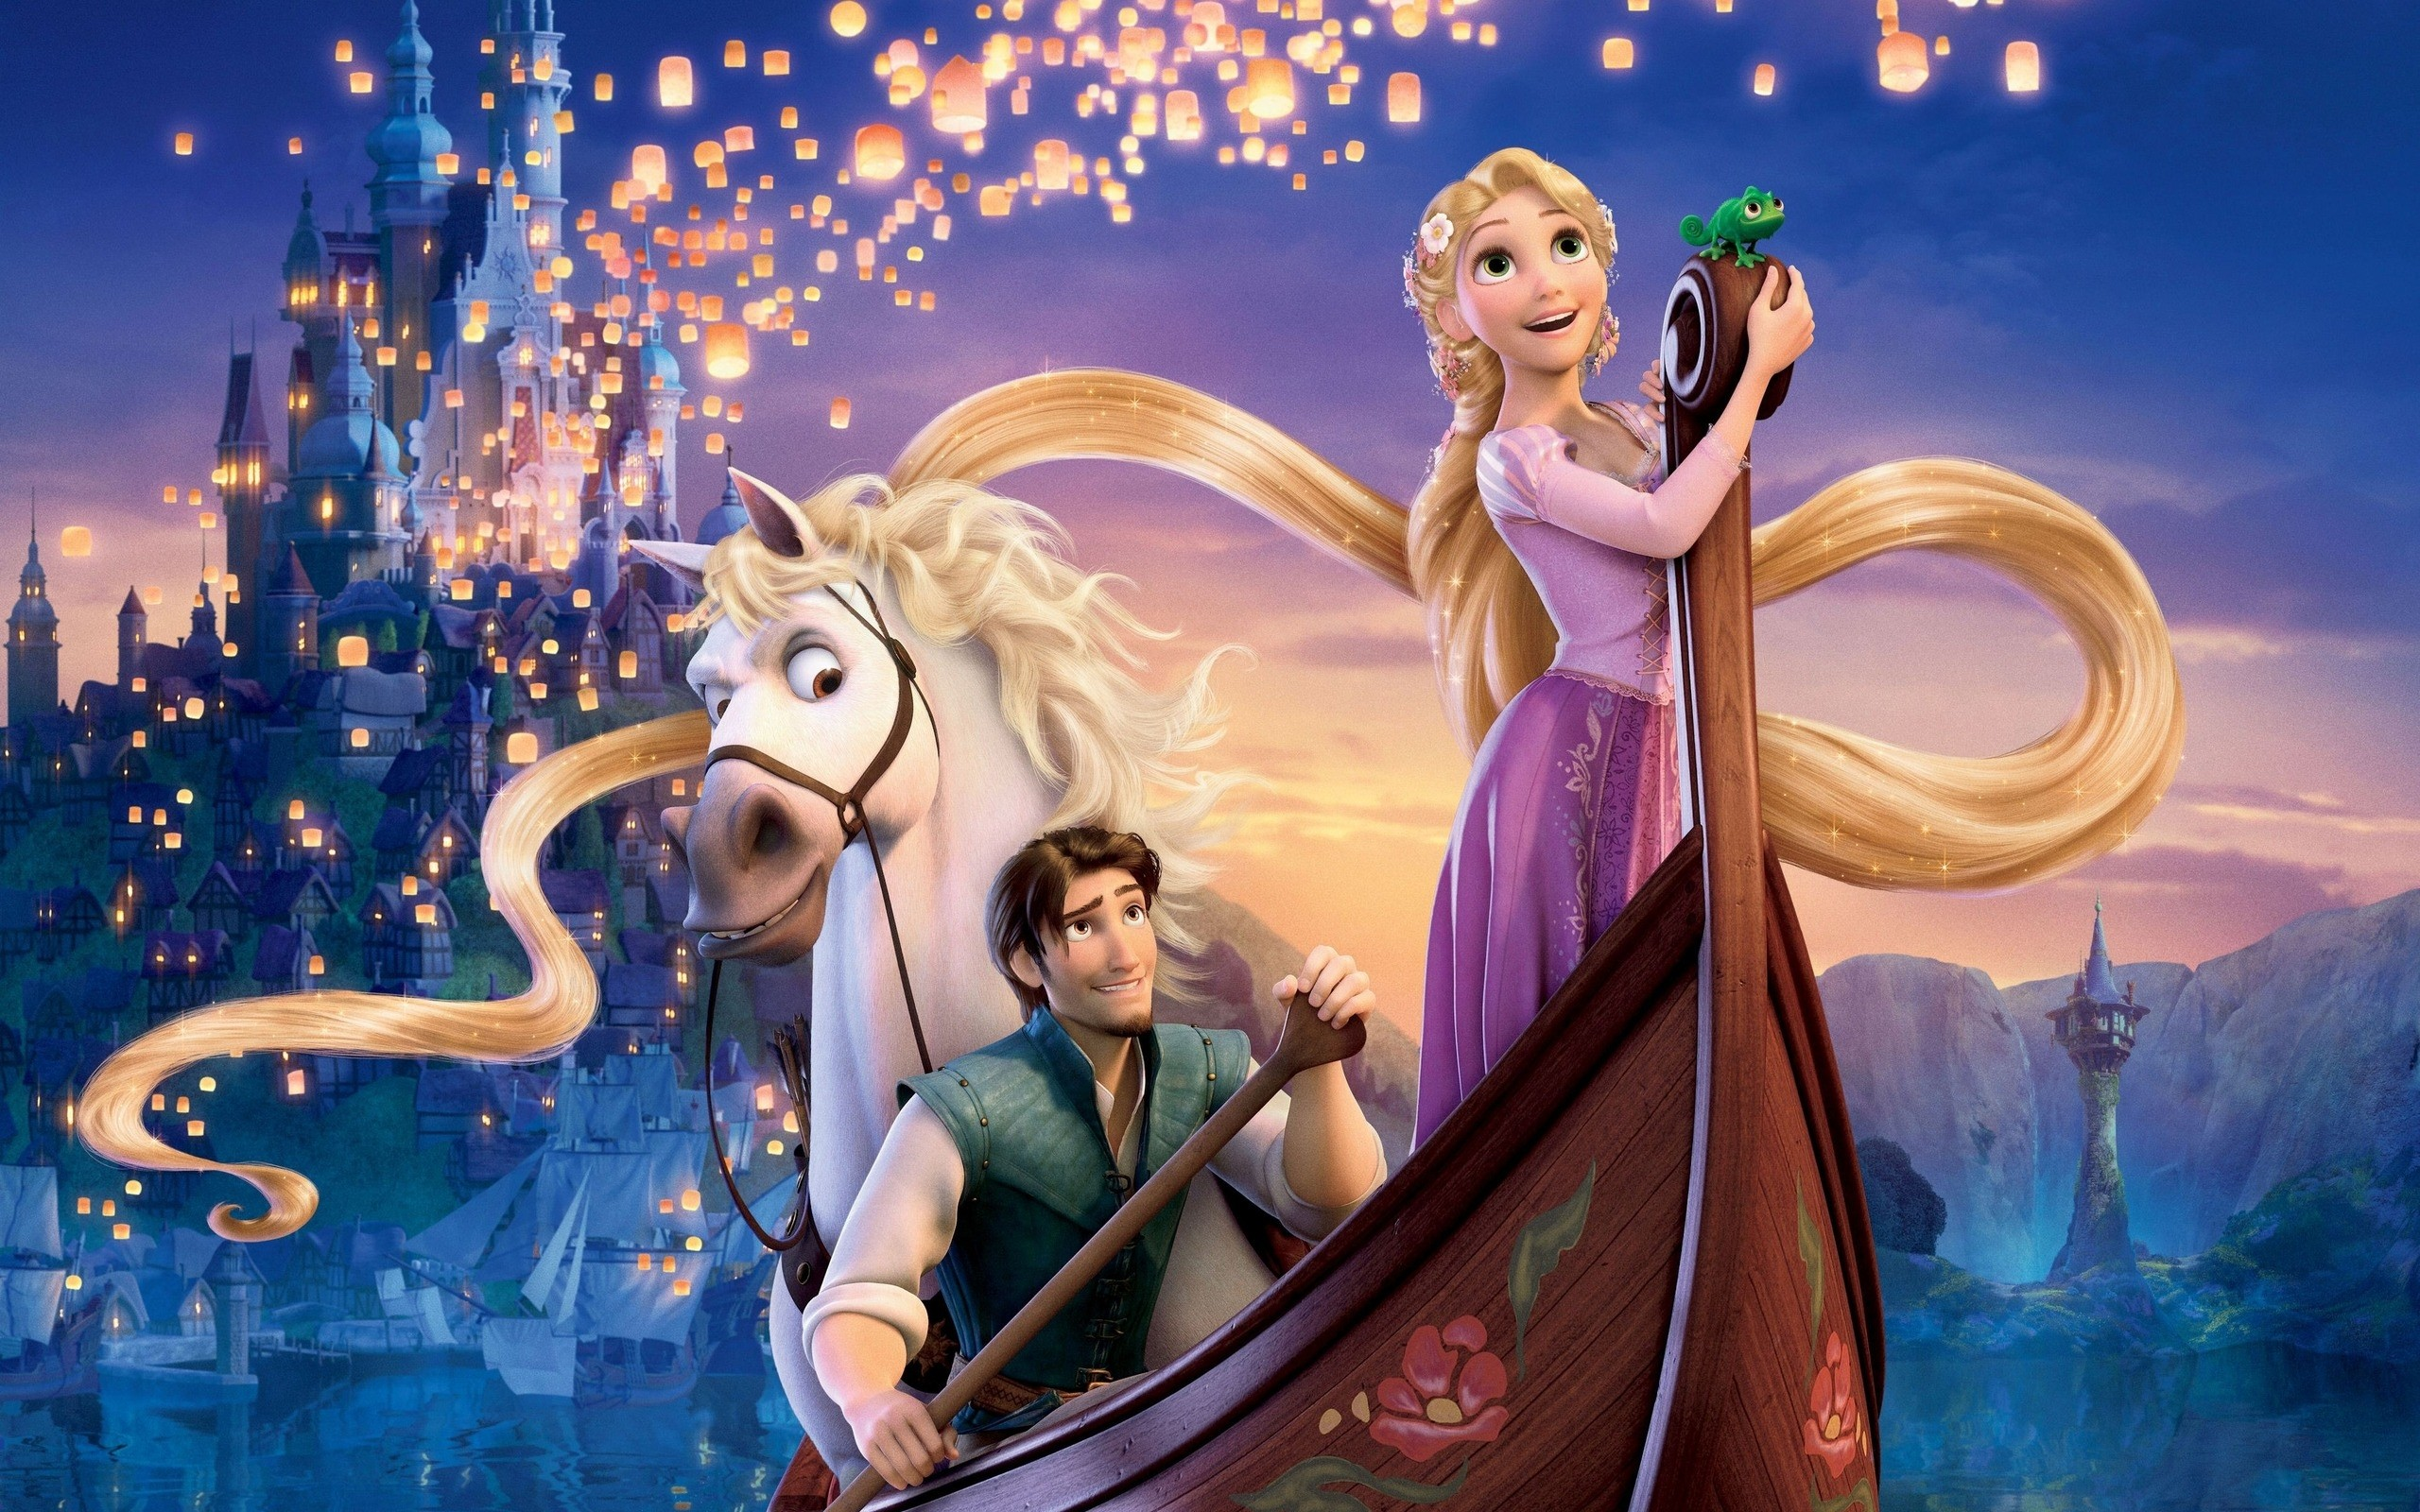 Tangled Musical Wallpaper, Disney Movies HD Widescreen Wallpapers 2560 .